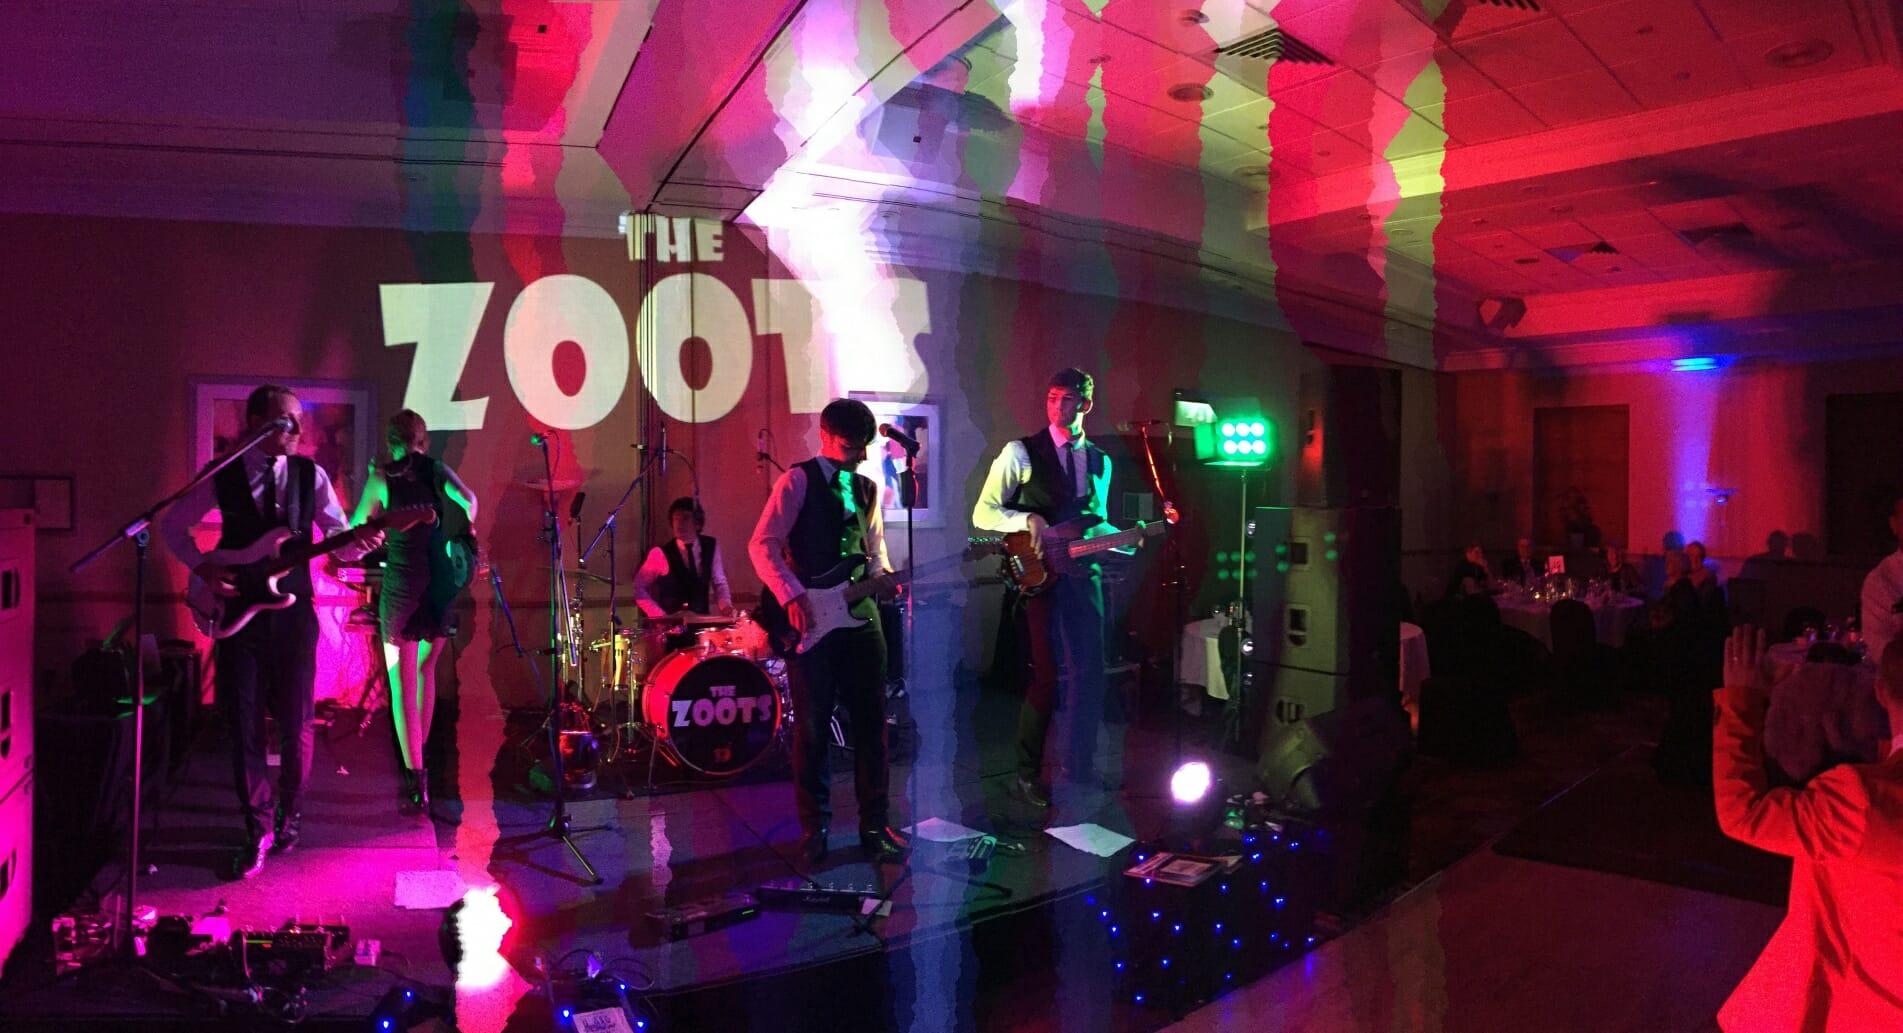 band in swindon, party band swindon, party band for marriott swindon, band for marriet, band for marriott, marriot swindon, wedding band swindon,